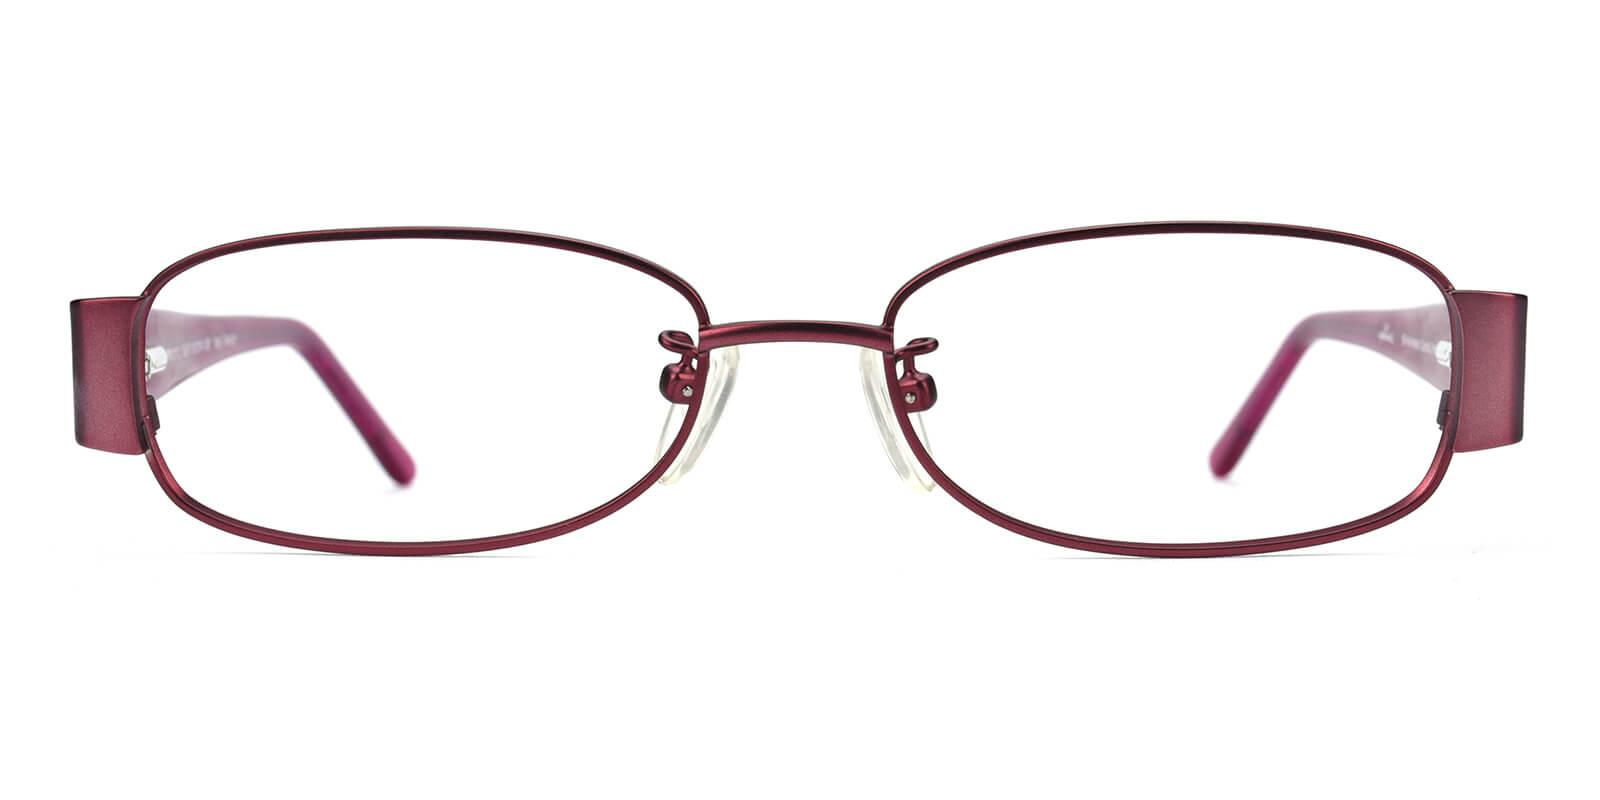 Janniey-Purple-Rectangle-Metal-Eyeglasses-additional2